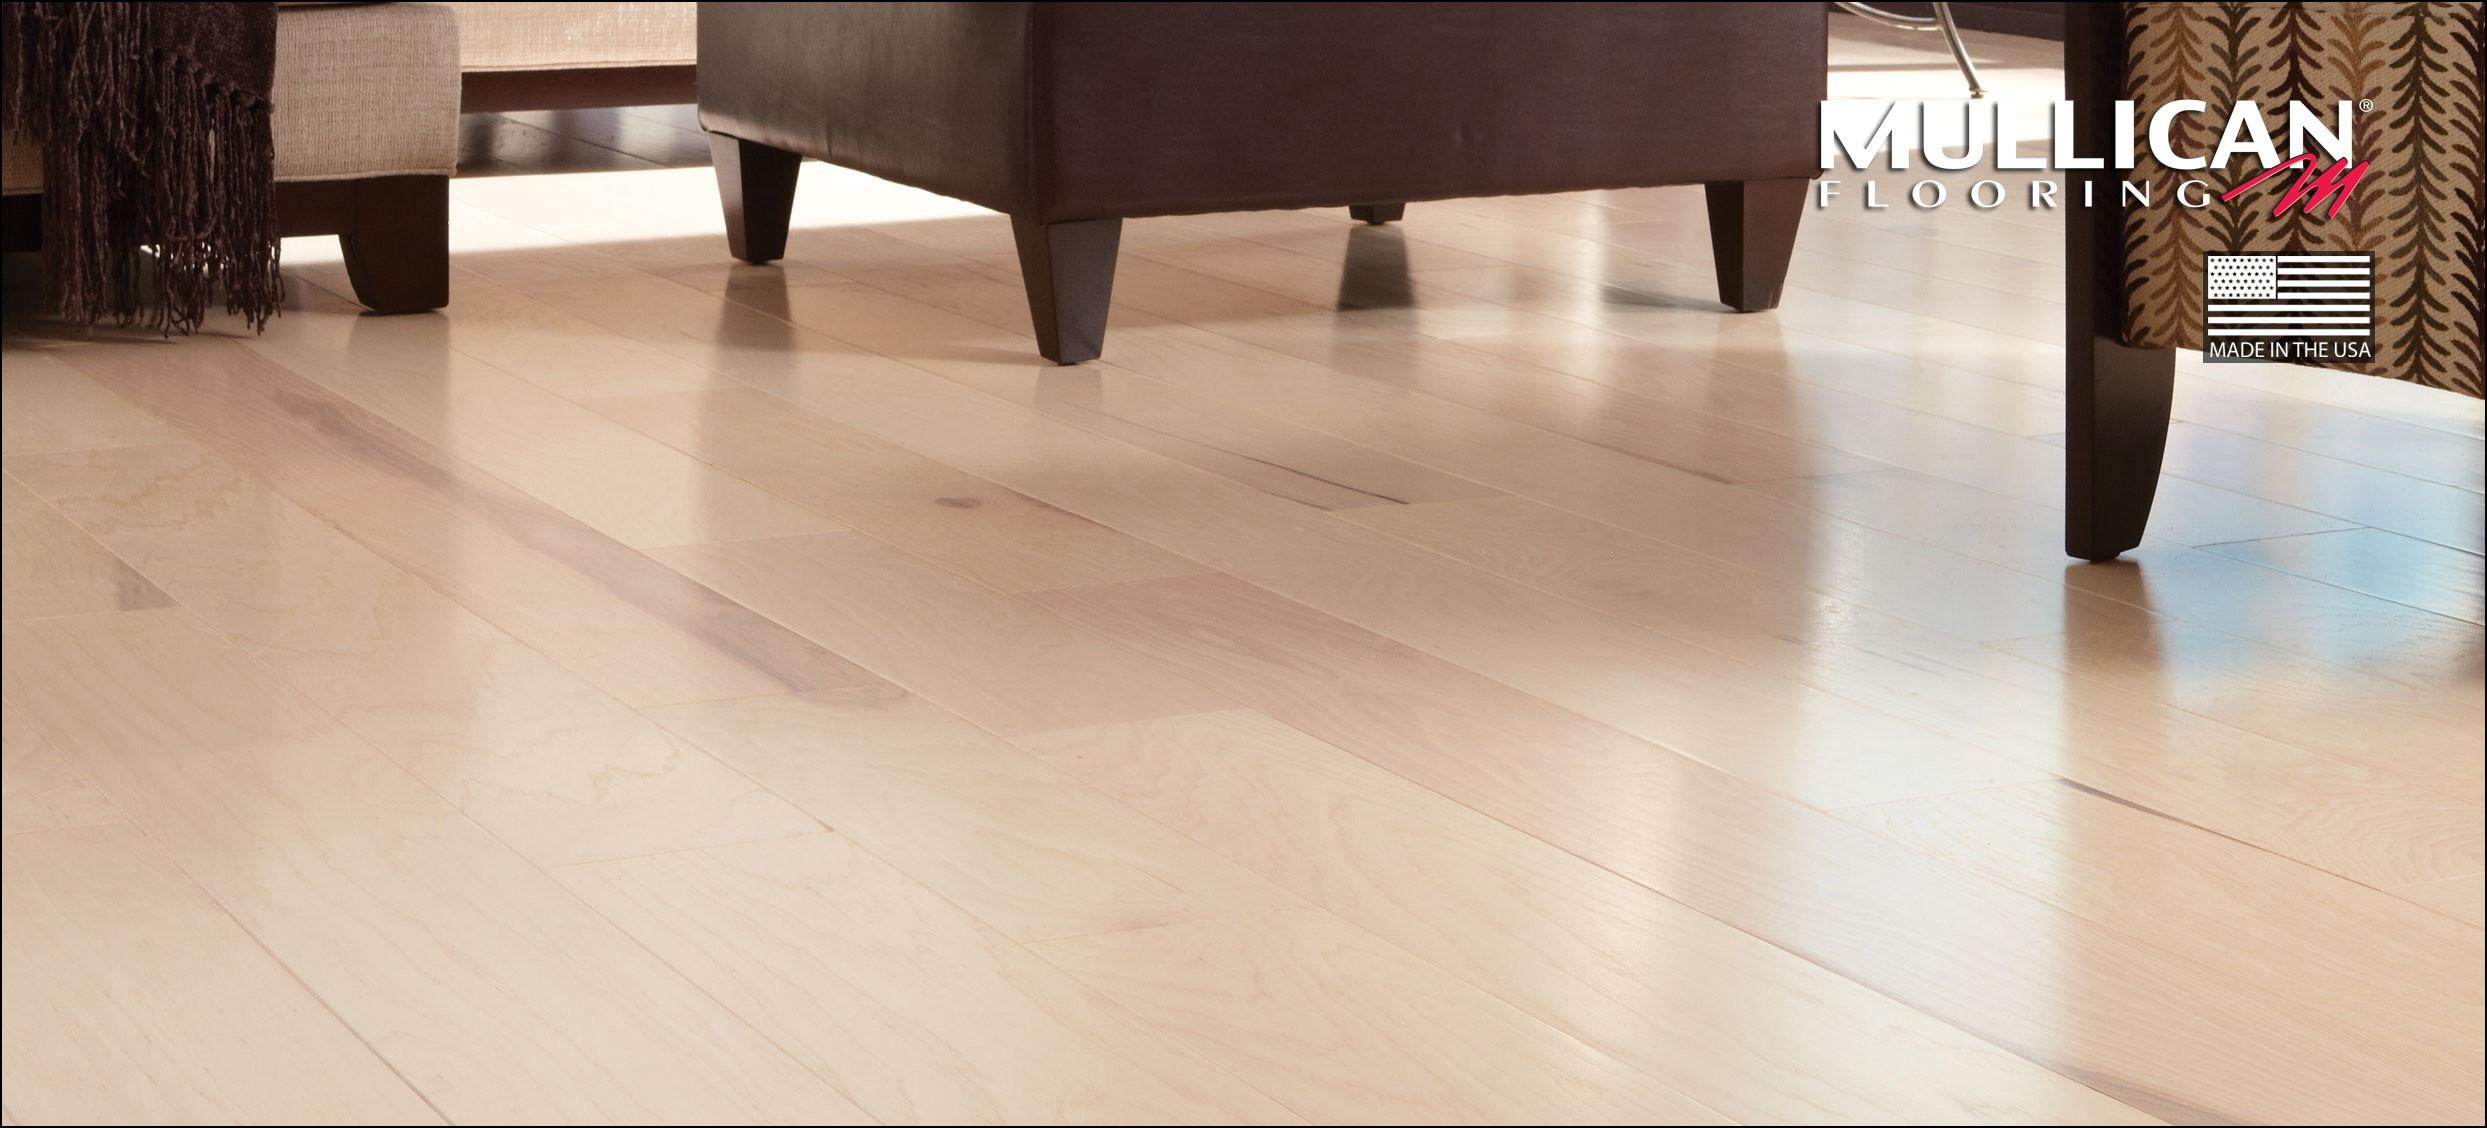 hardwood floor width of hardwood flooring suppliers france flooring ideas inside hardwood flooring installation san diego mullican flooring home of hardwood flooring installation san diego